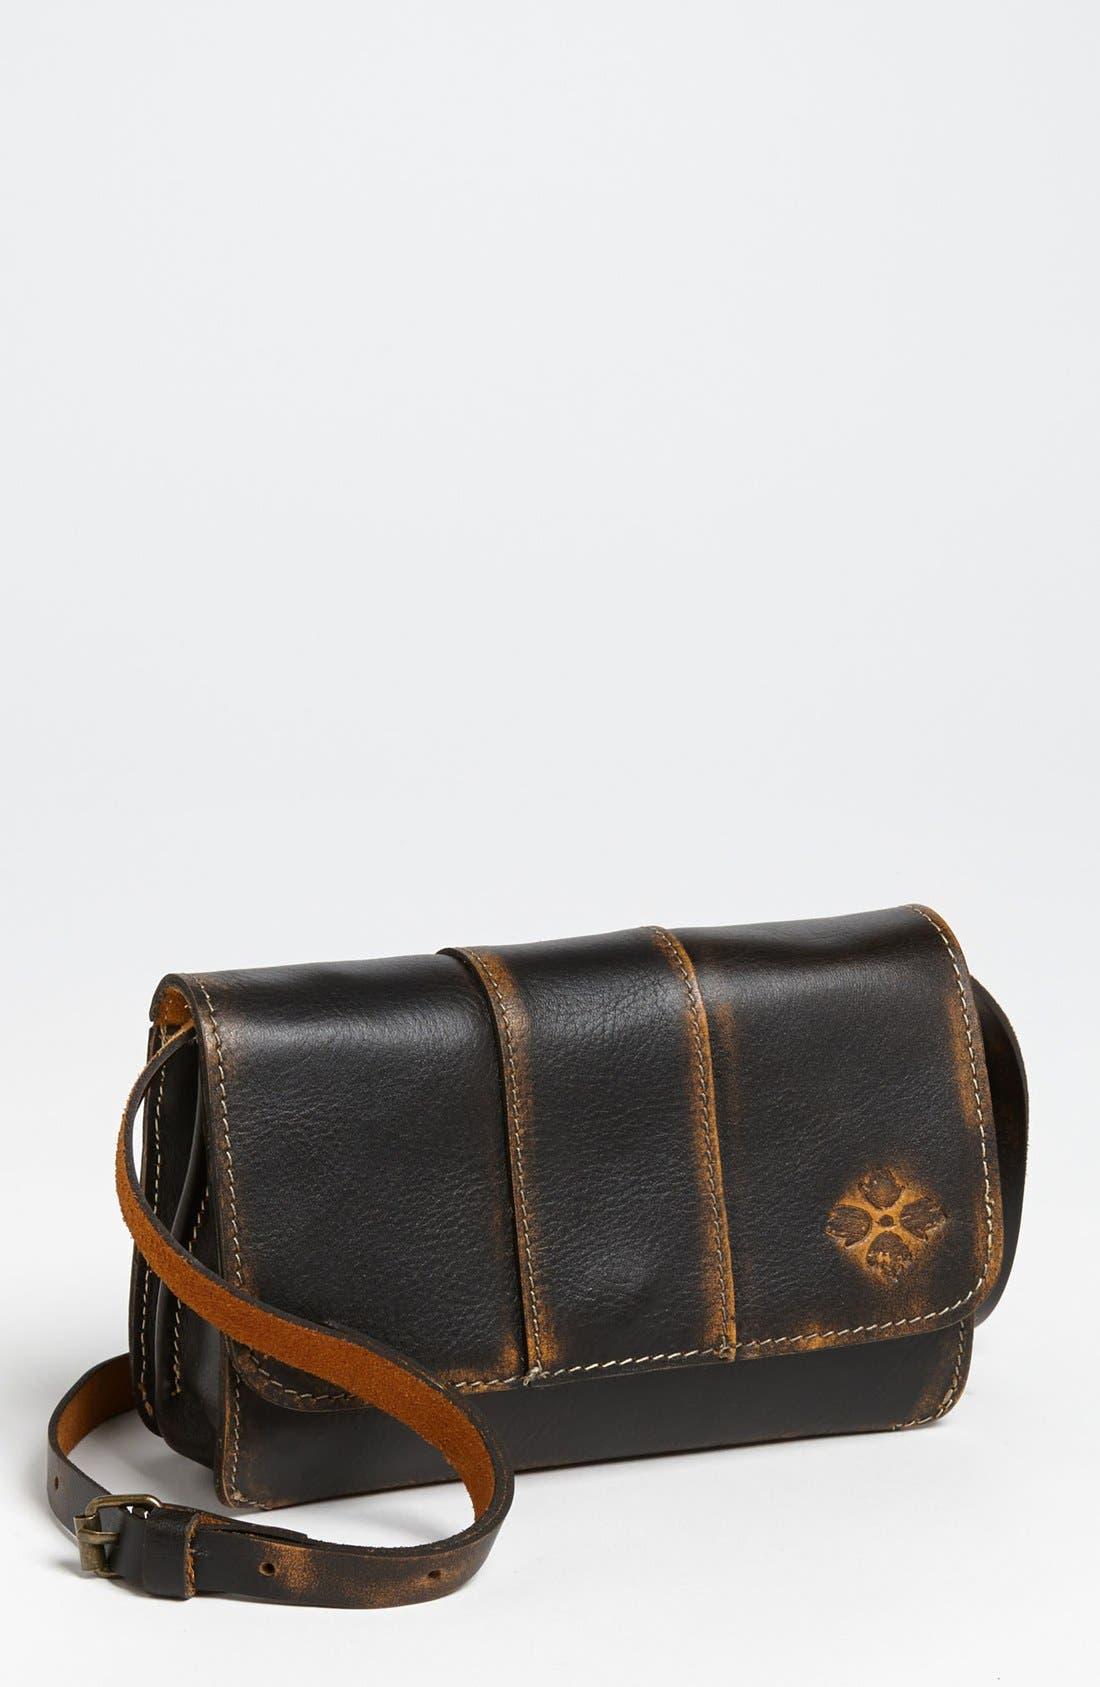 Alternate Image 1 Selected - Patricia Nash 'Torri Overdye' Crossbody Bag